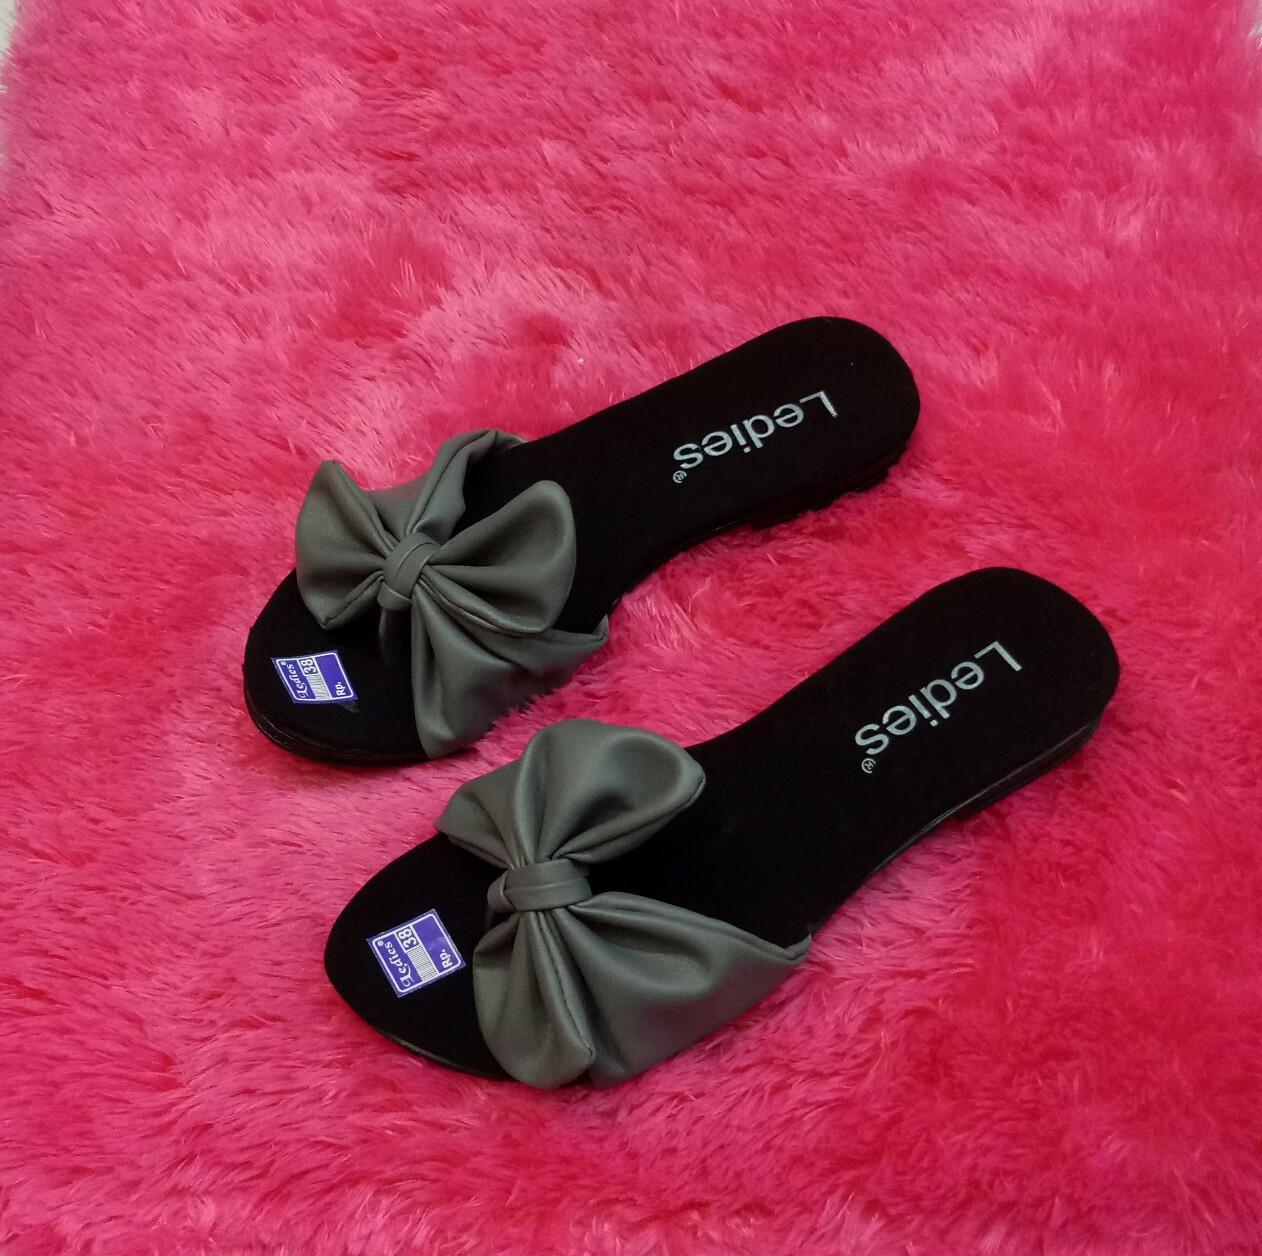 Rafishashoes Sandal Teplek Pita Kunyit Spec Dan Daftar Harga Kuramo Tho Detail Gambar Minangka Jaya Kokop Terkini